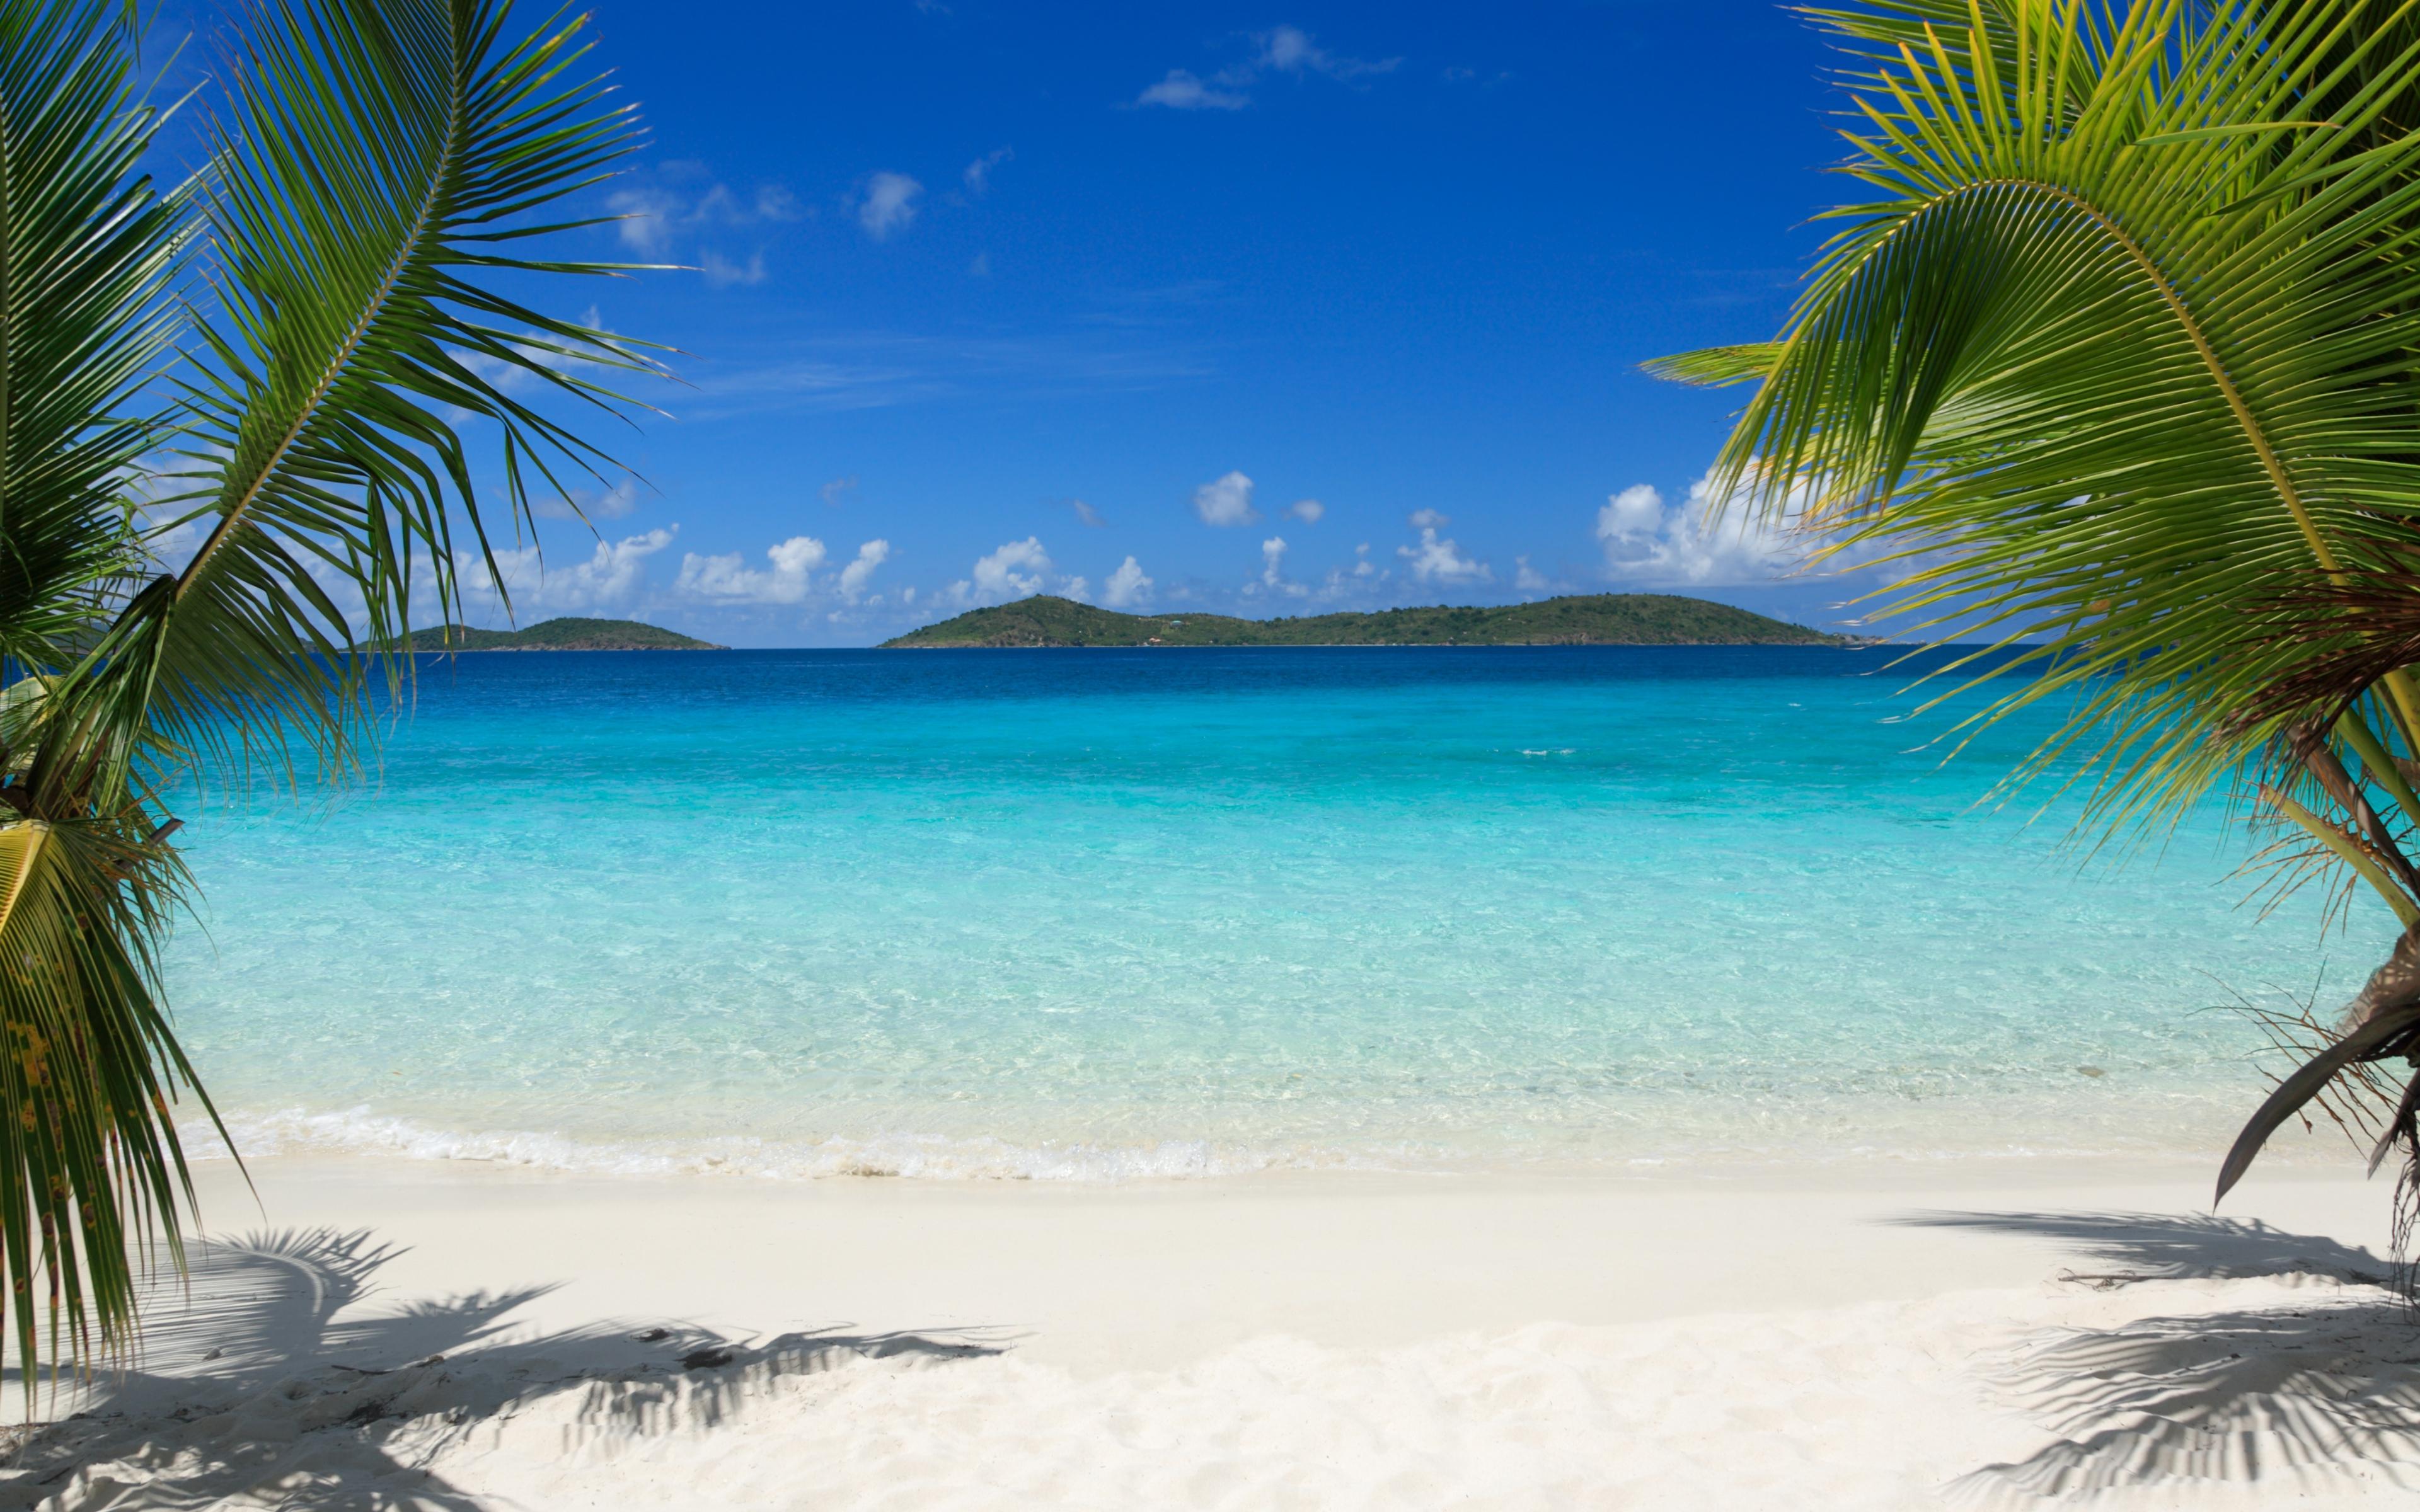 Tropical Island Beach Palm Trees Sea Waves Wallpaper WallpapersByte 3840x2400